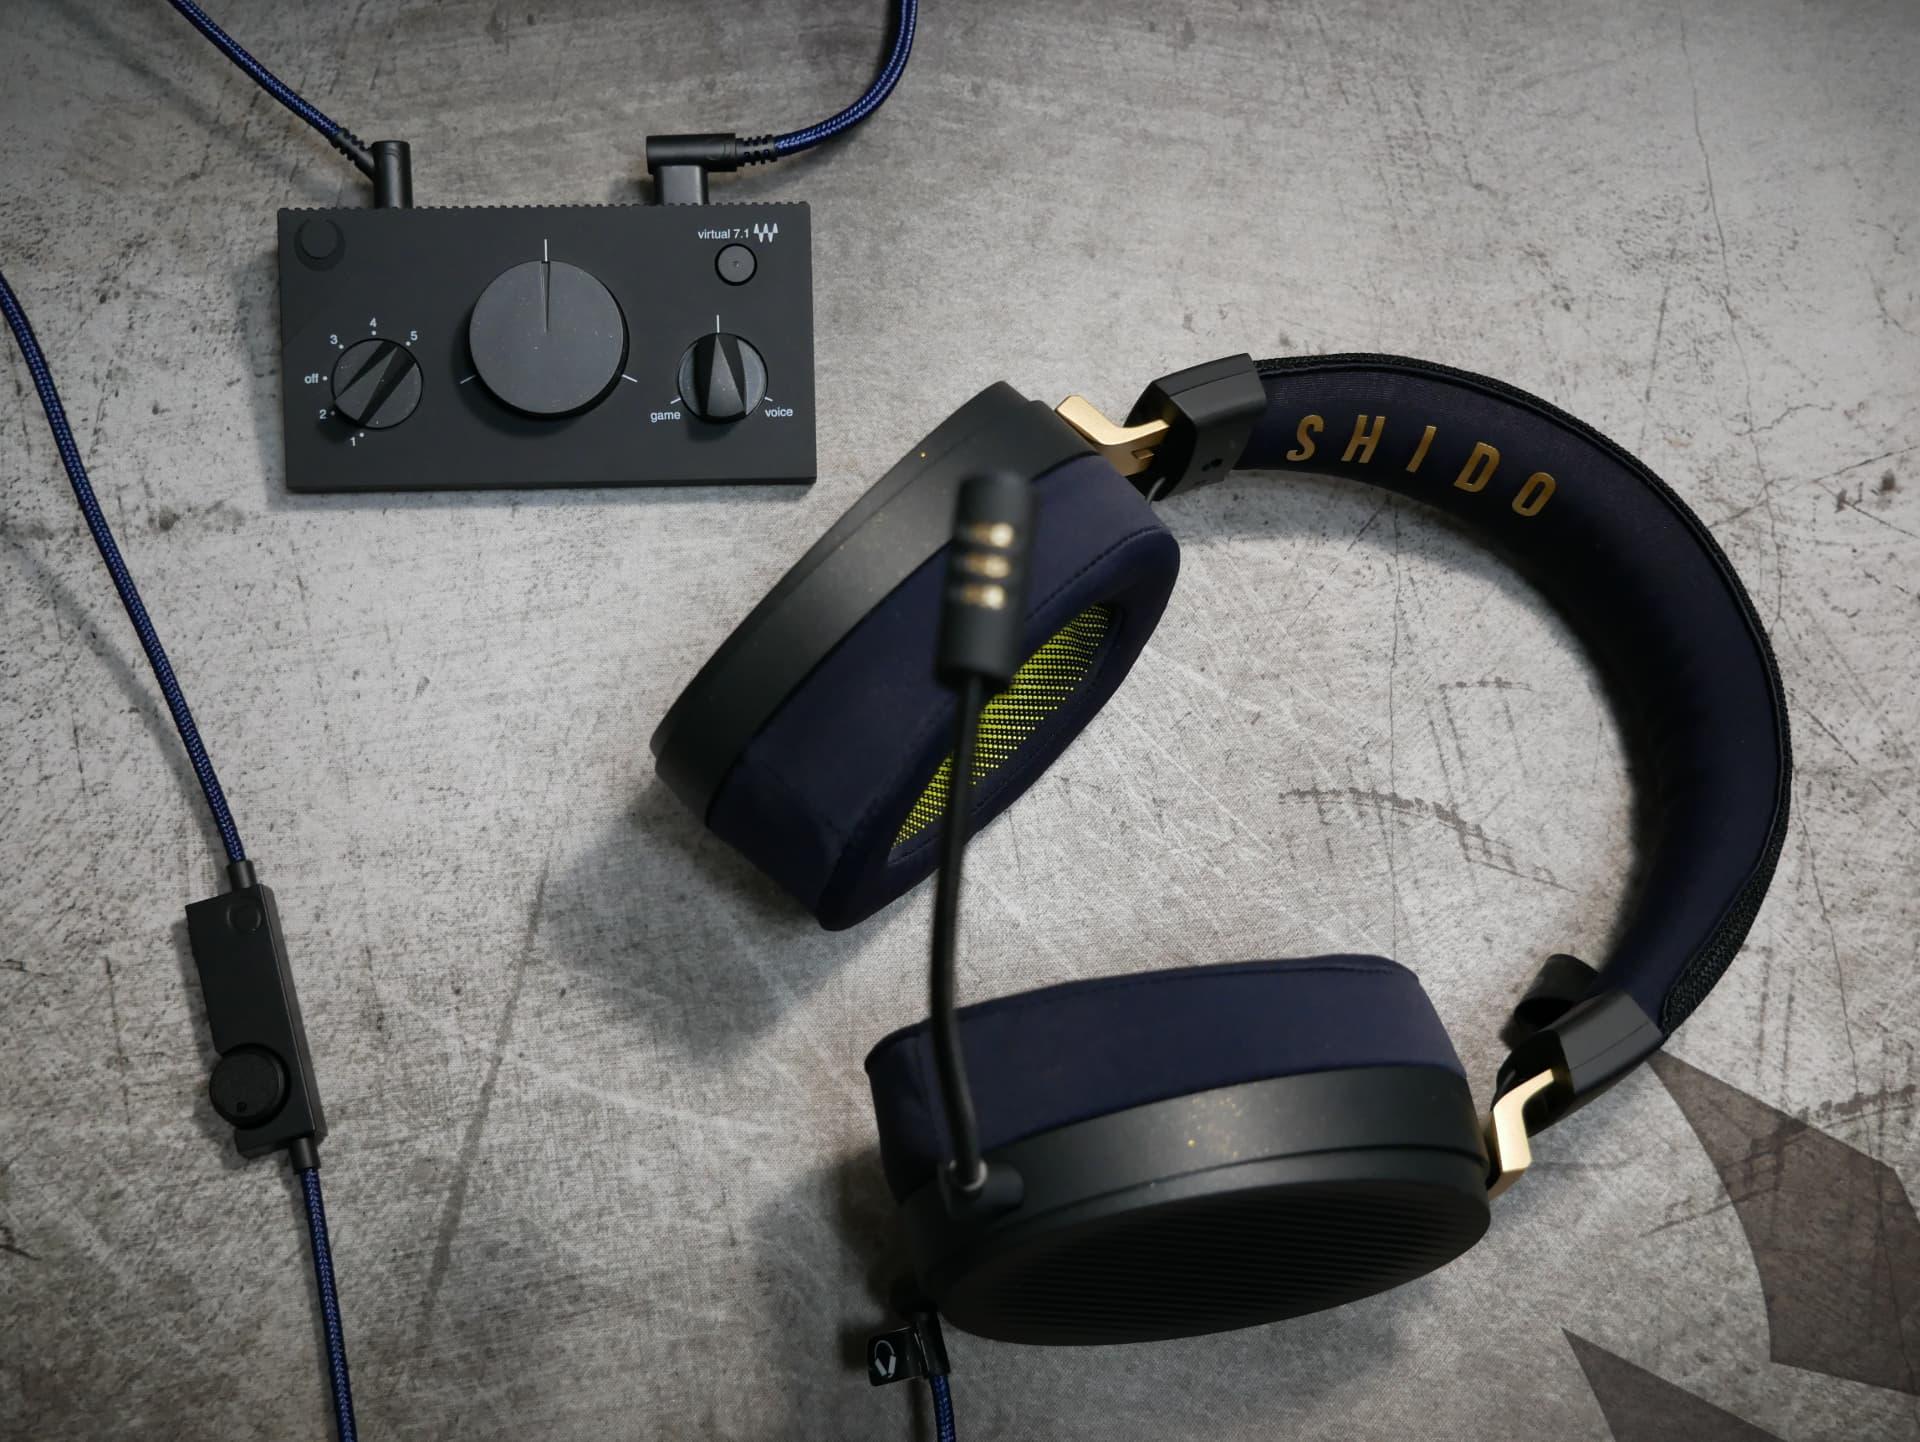 「SHIDO:001 / SHIDO:002」レビュー。オンキヨー初のゲーマー向け製品は粗削りながらFPSに最適なサウンドをもたらす